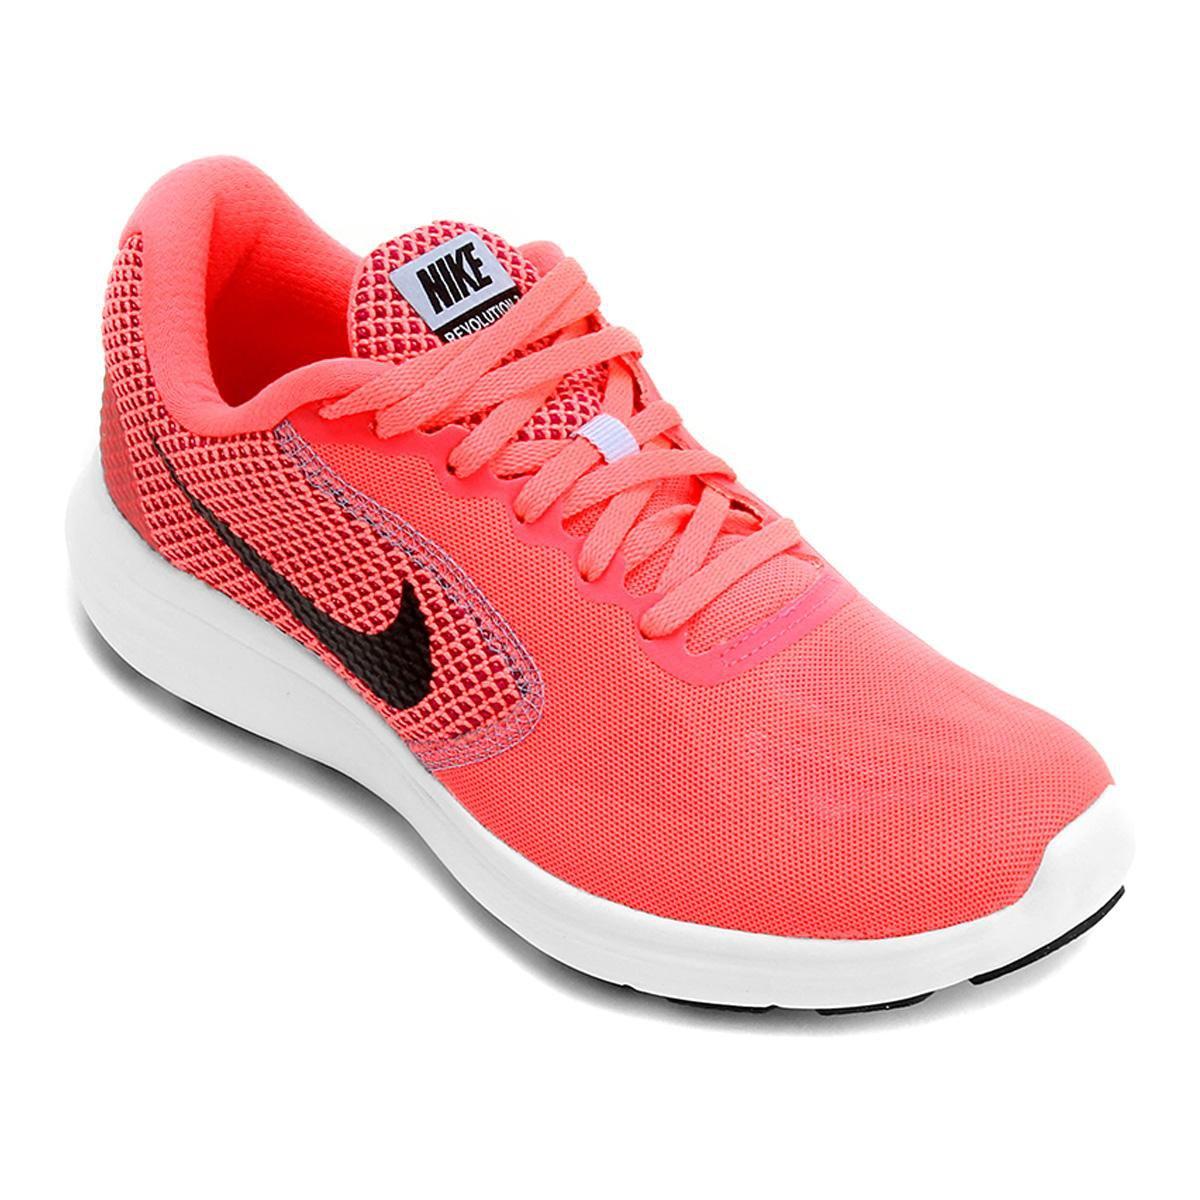 5a0f4ddf70c ... promo code tênis nike revolution 3 feminino pink 8d6fe 596f6 ...